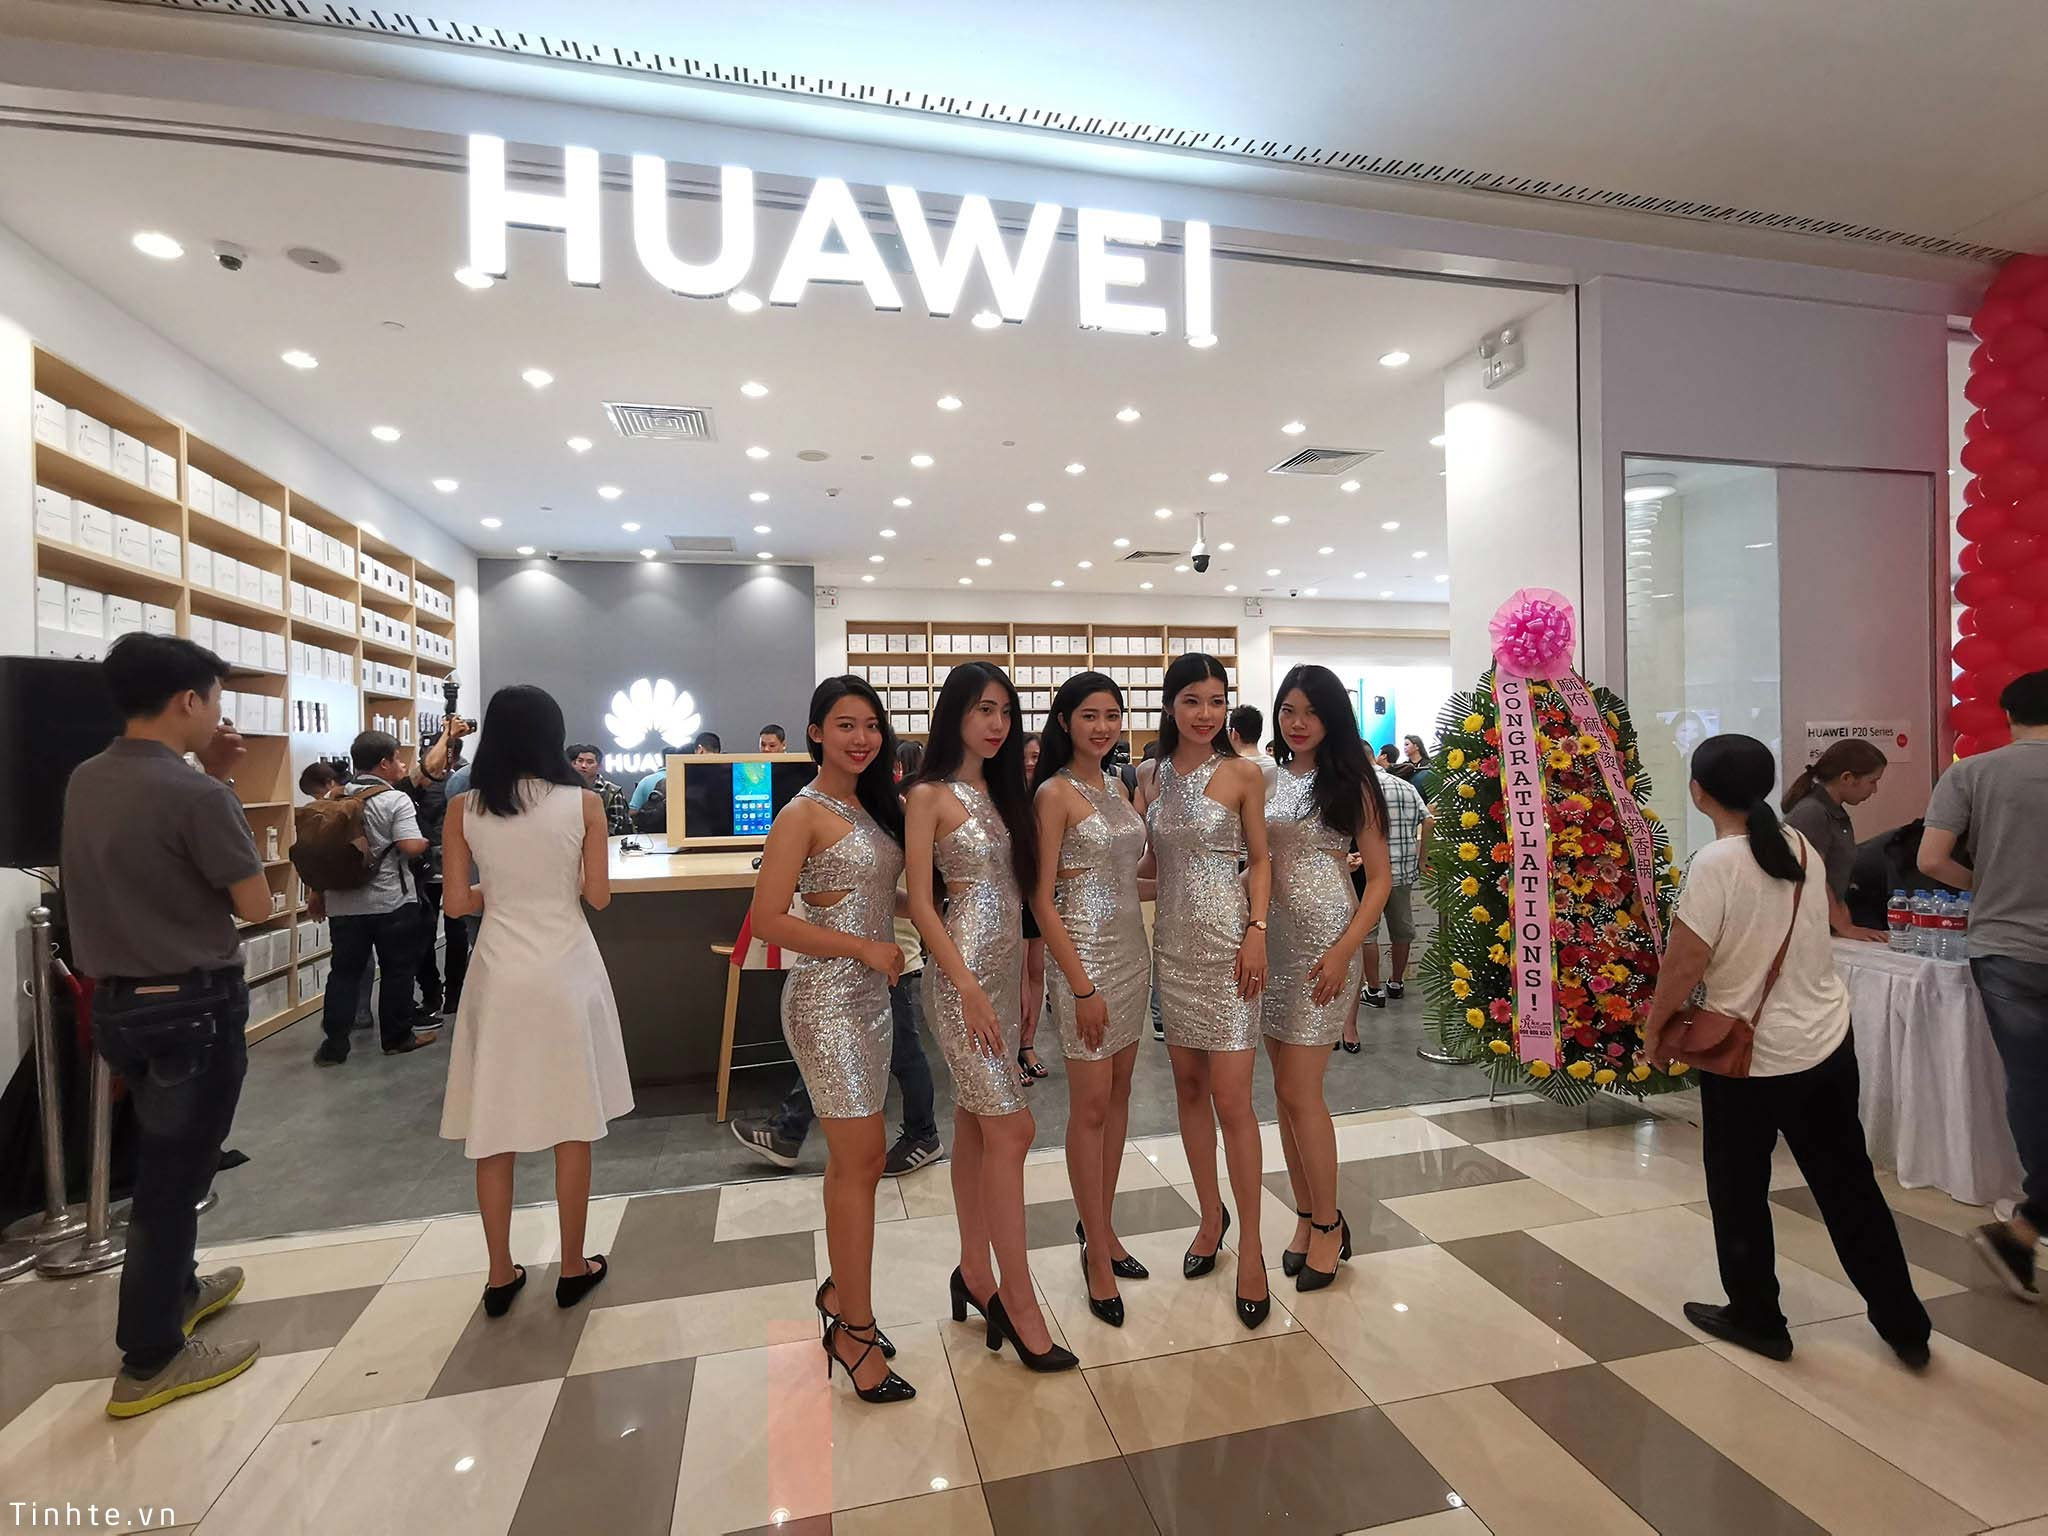 Huawei_mate_20_Tinhte_1.jpg